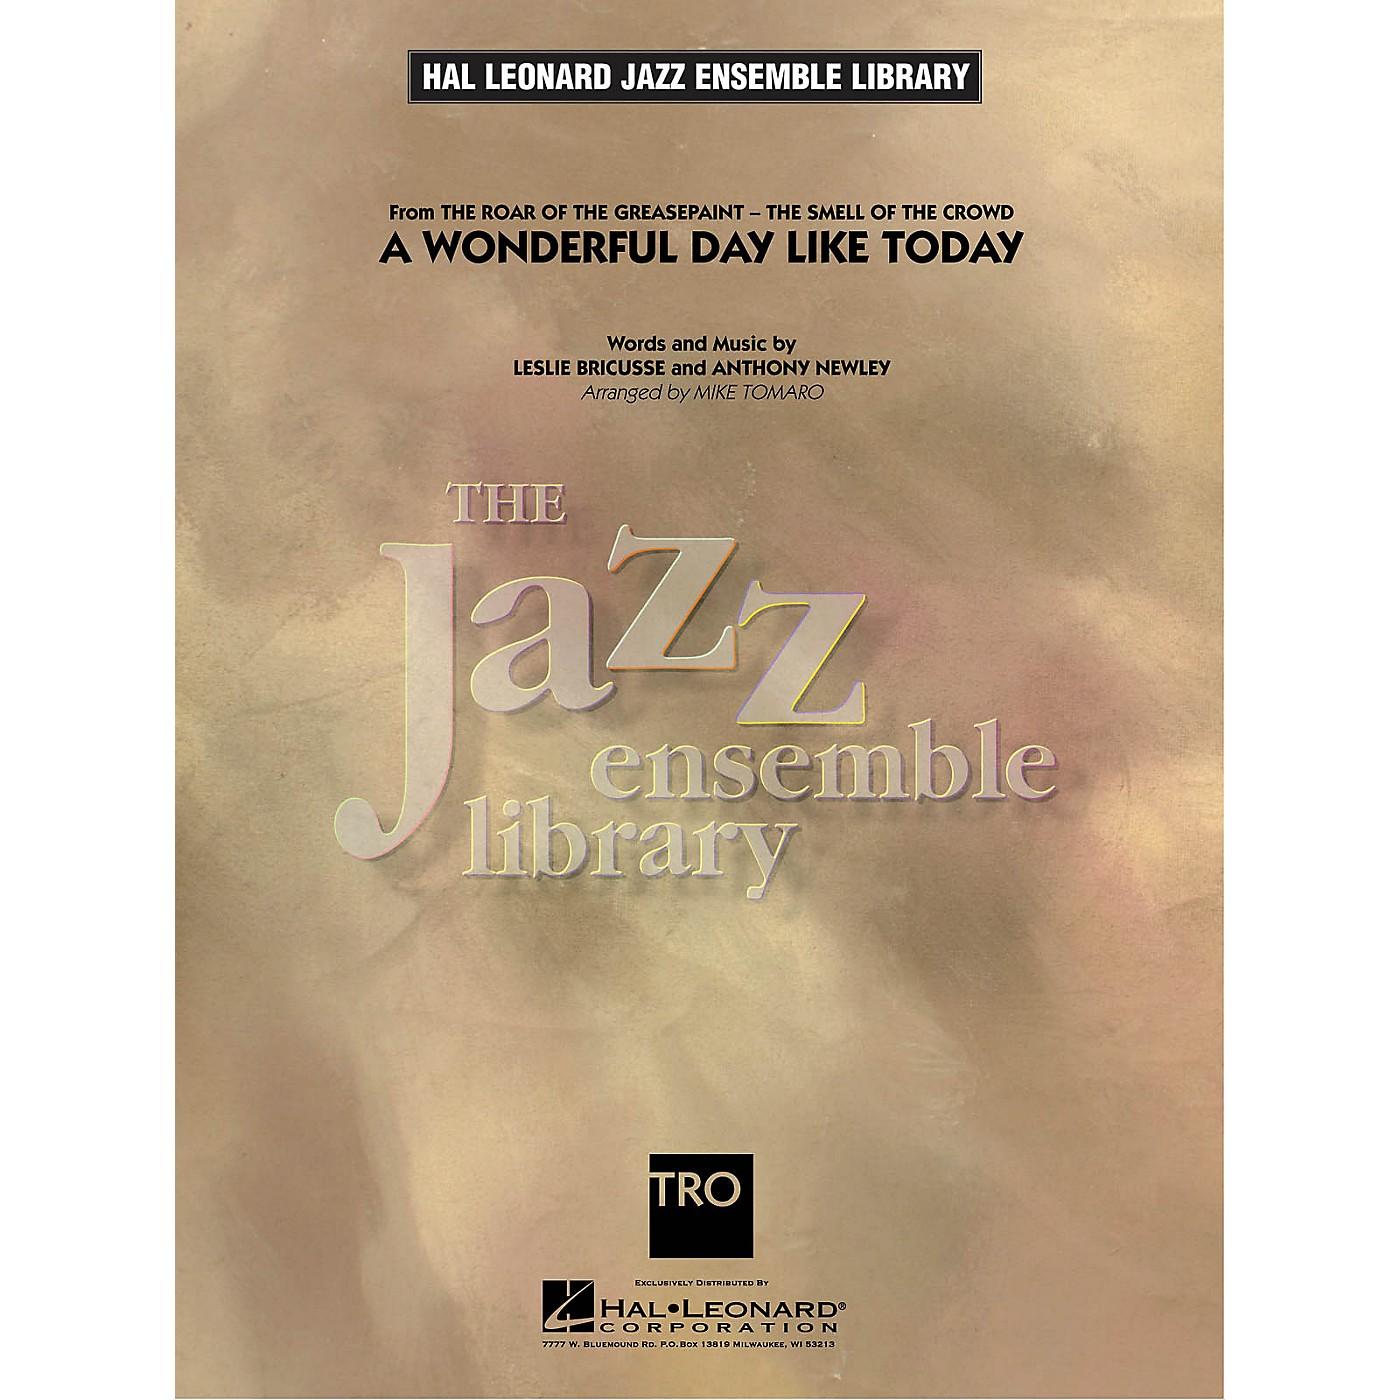 Hal Leonard A Wonderful Day Like Today Jazz Band Level 4 Arranged by Mike Tomaro thumbnail